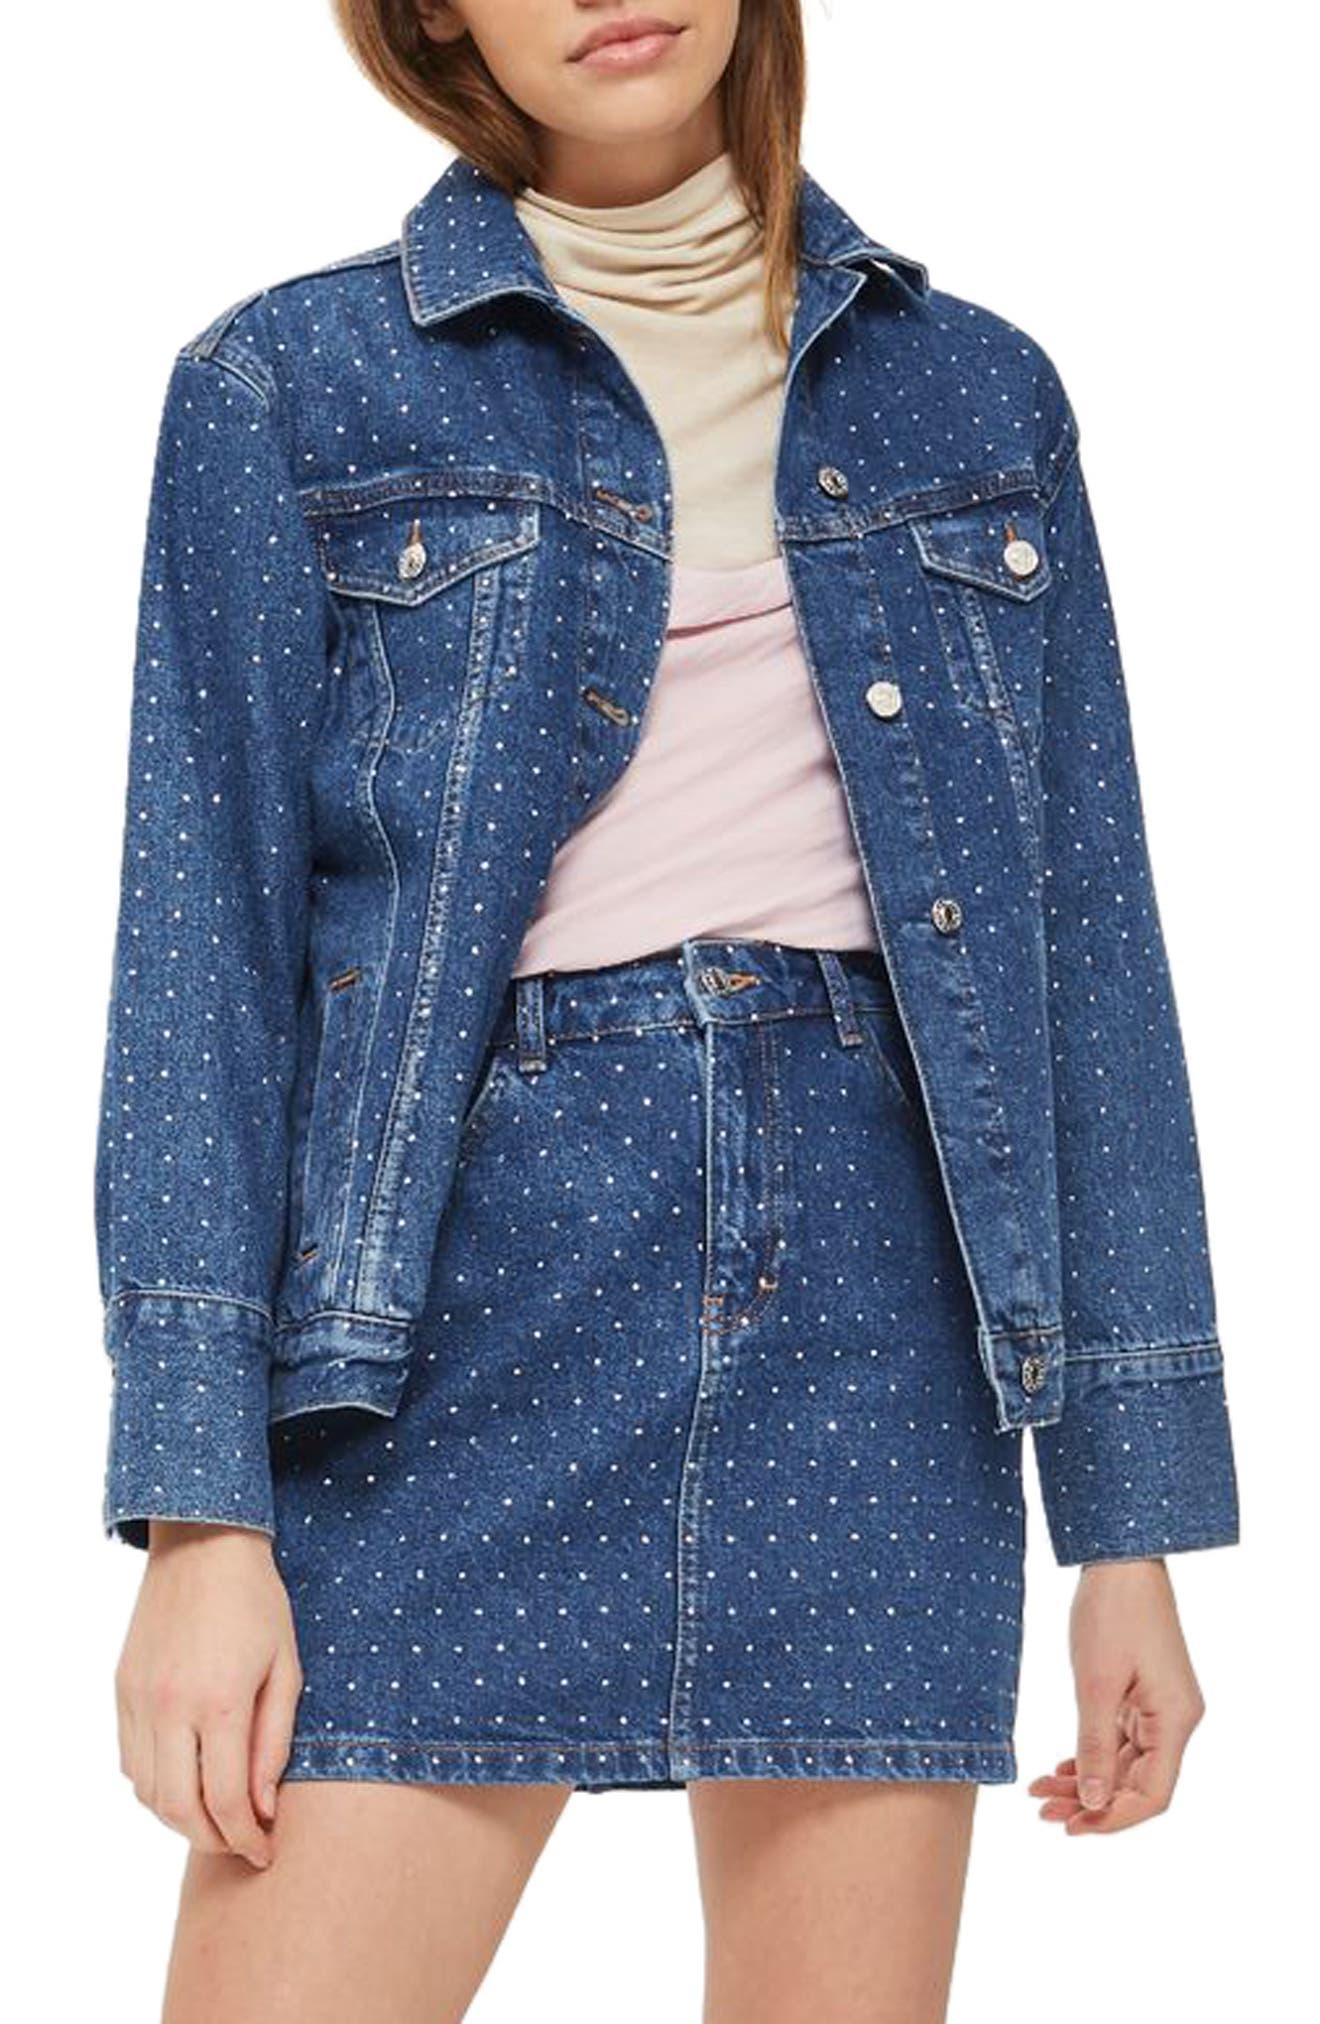 Crystal Studded Denim Jacket,                             Main thumbnail 1, color,                             400